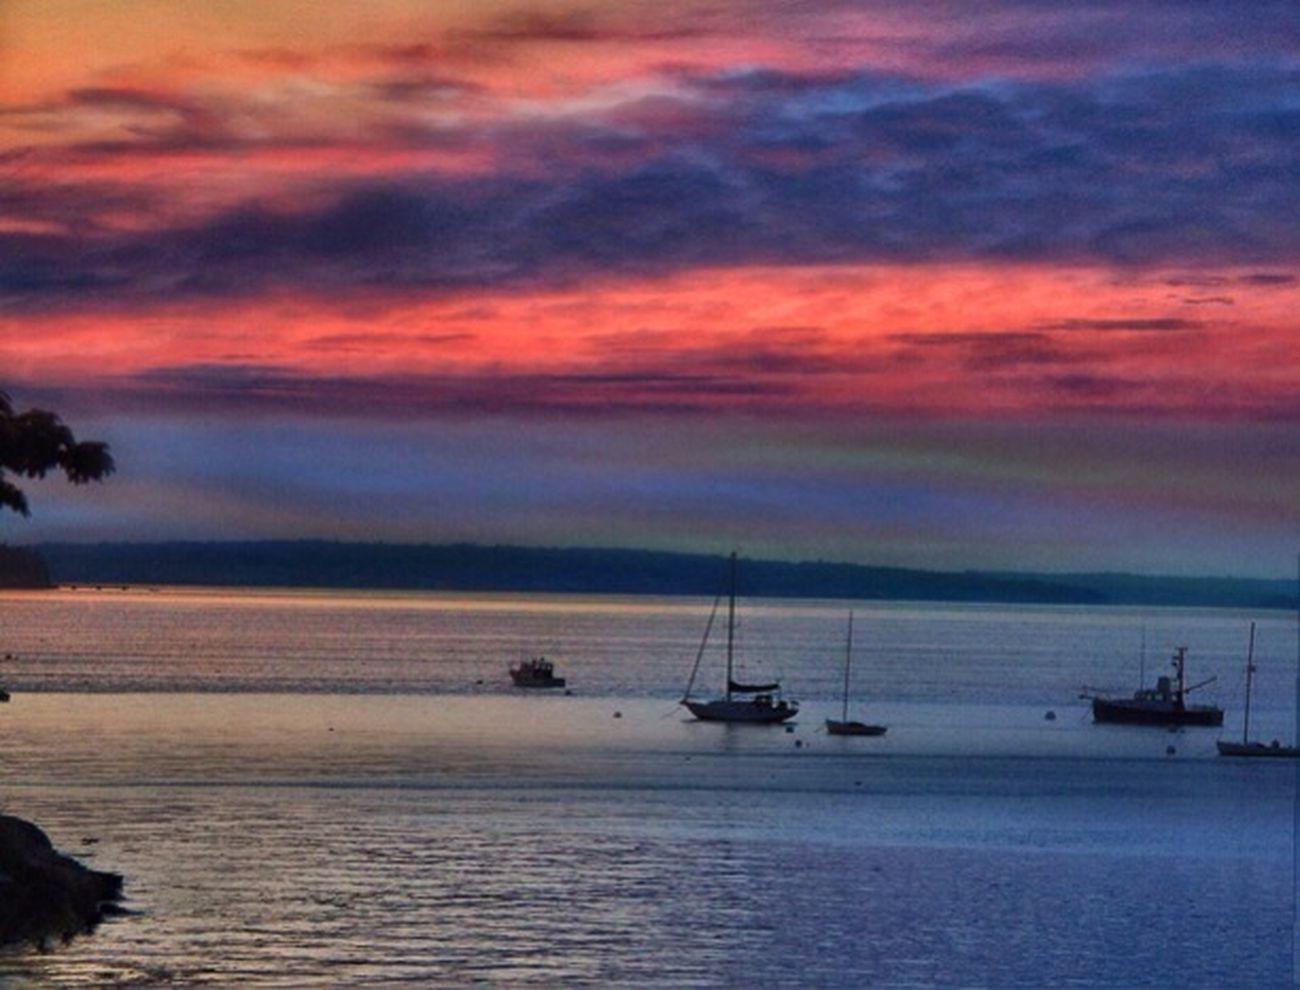 Safe Harbor. Sunset #skyporn #cloudporn # Bestskyever #gorgeous # Beautiful #stunning Water_collection Taking Photos